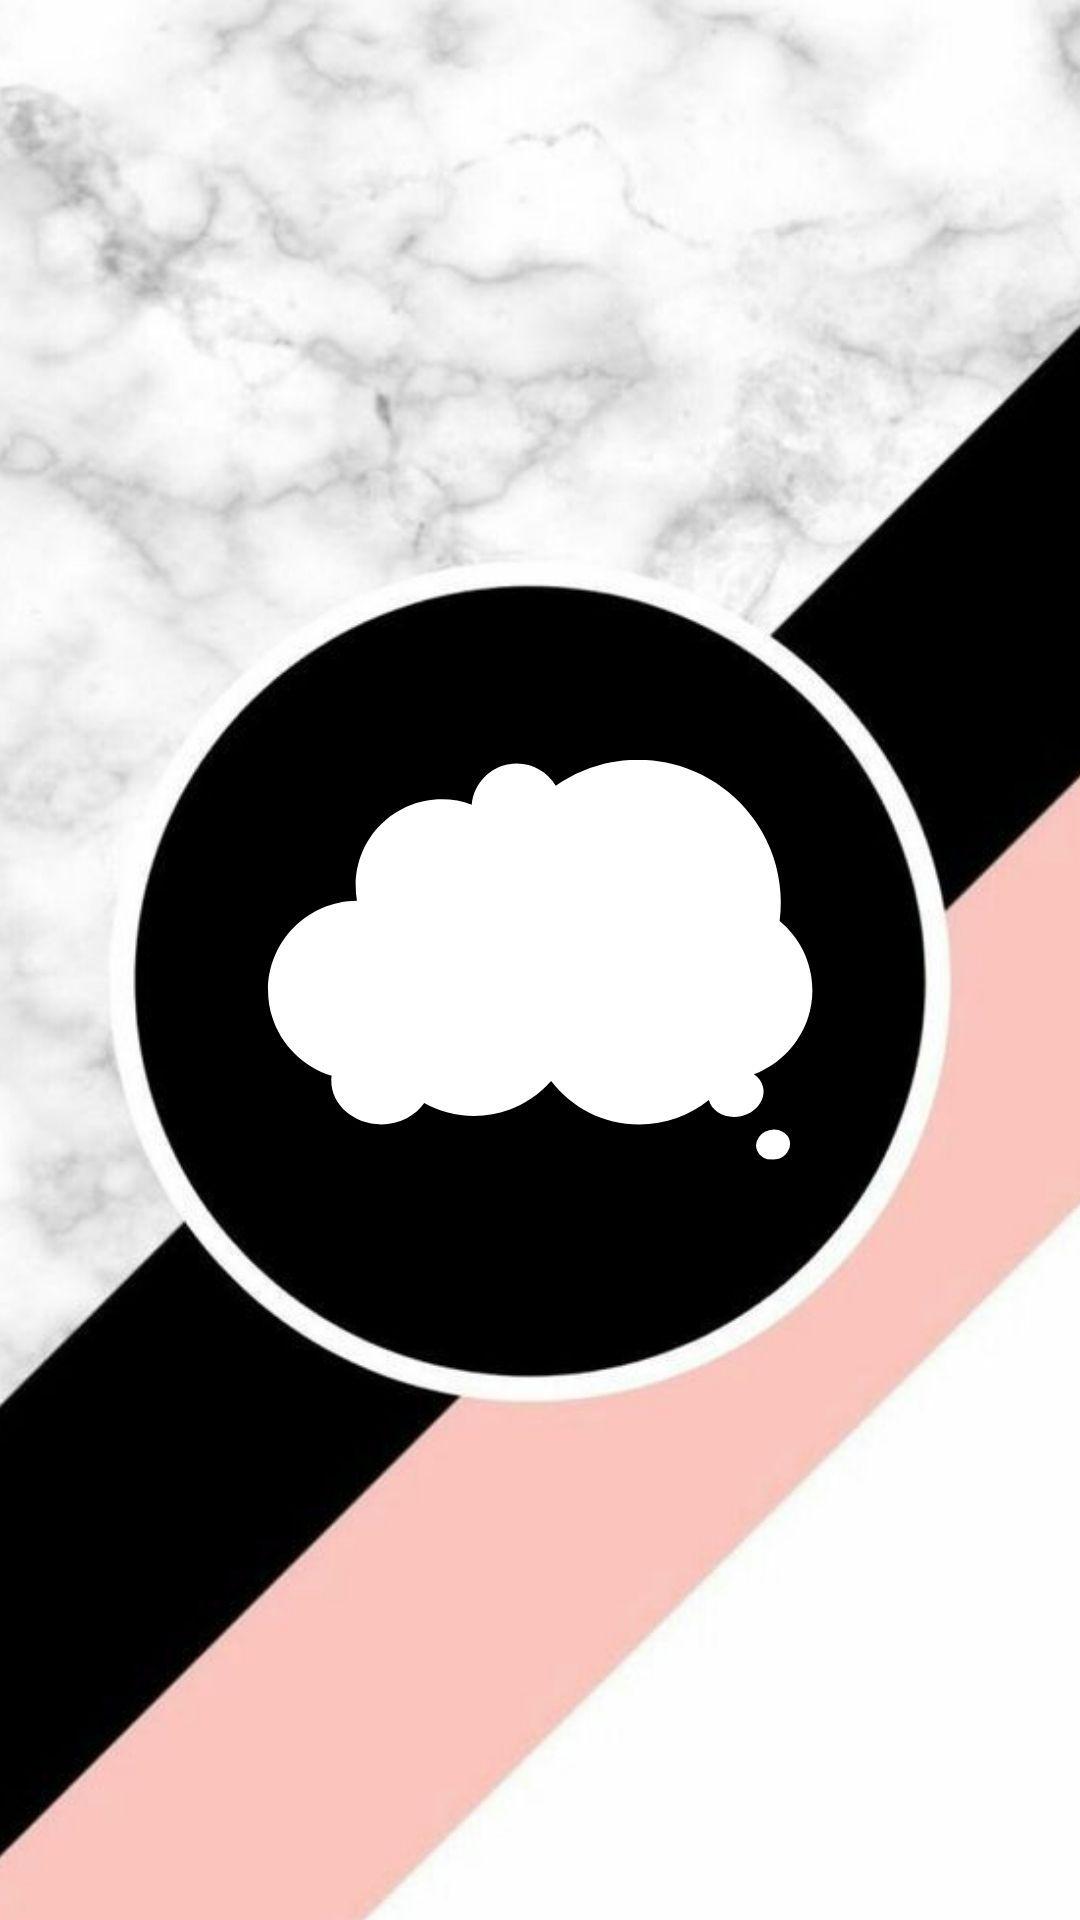 Pin Oleh Friska Di Sorotan Ig Di 2020 Gambar Tahu Dekorasi